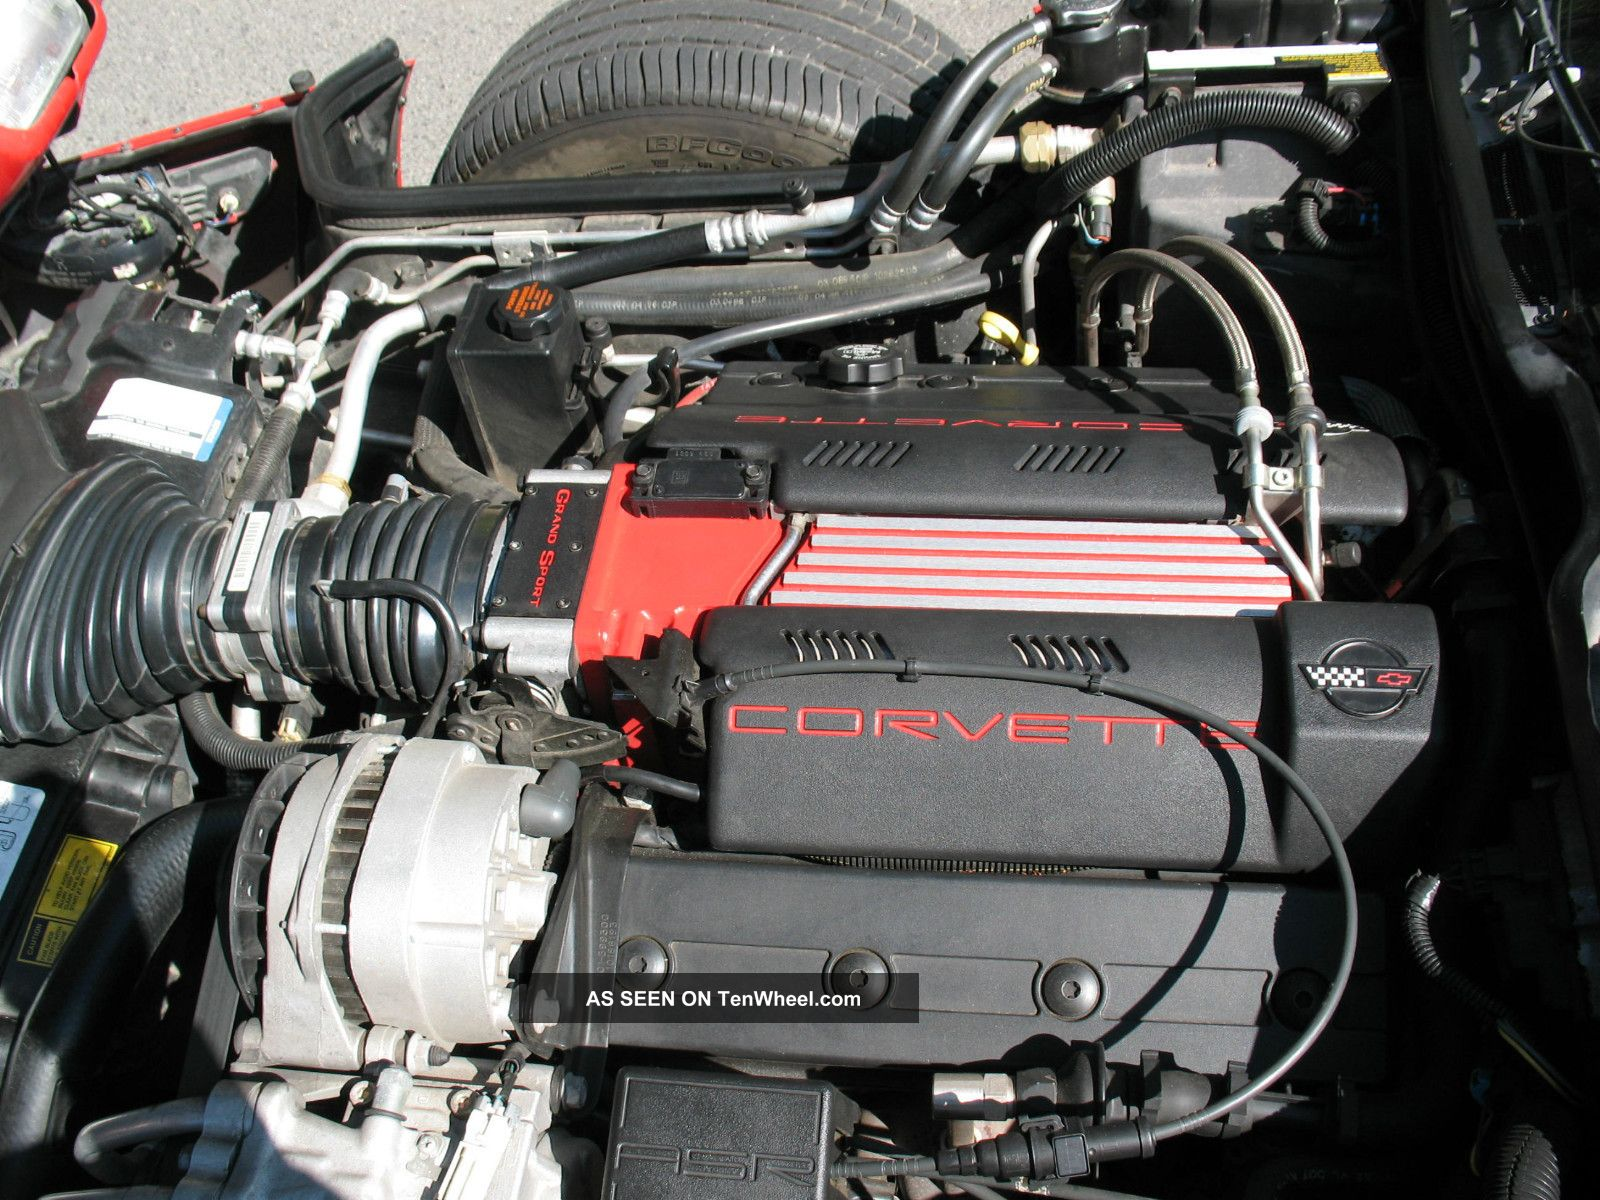 1996 Corvette 6 Spd Manual Lt4 Engine